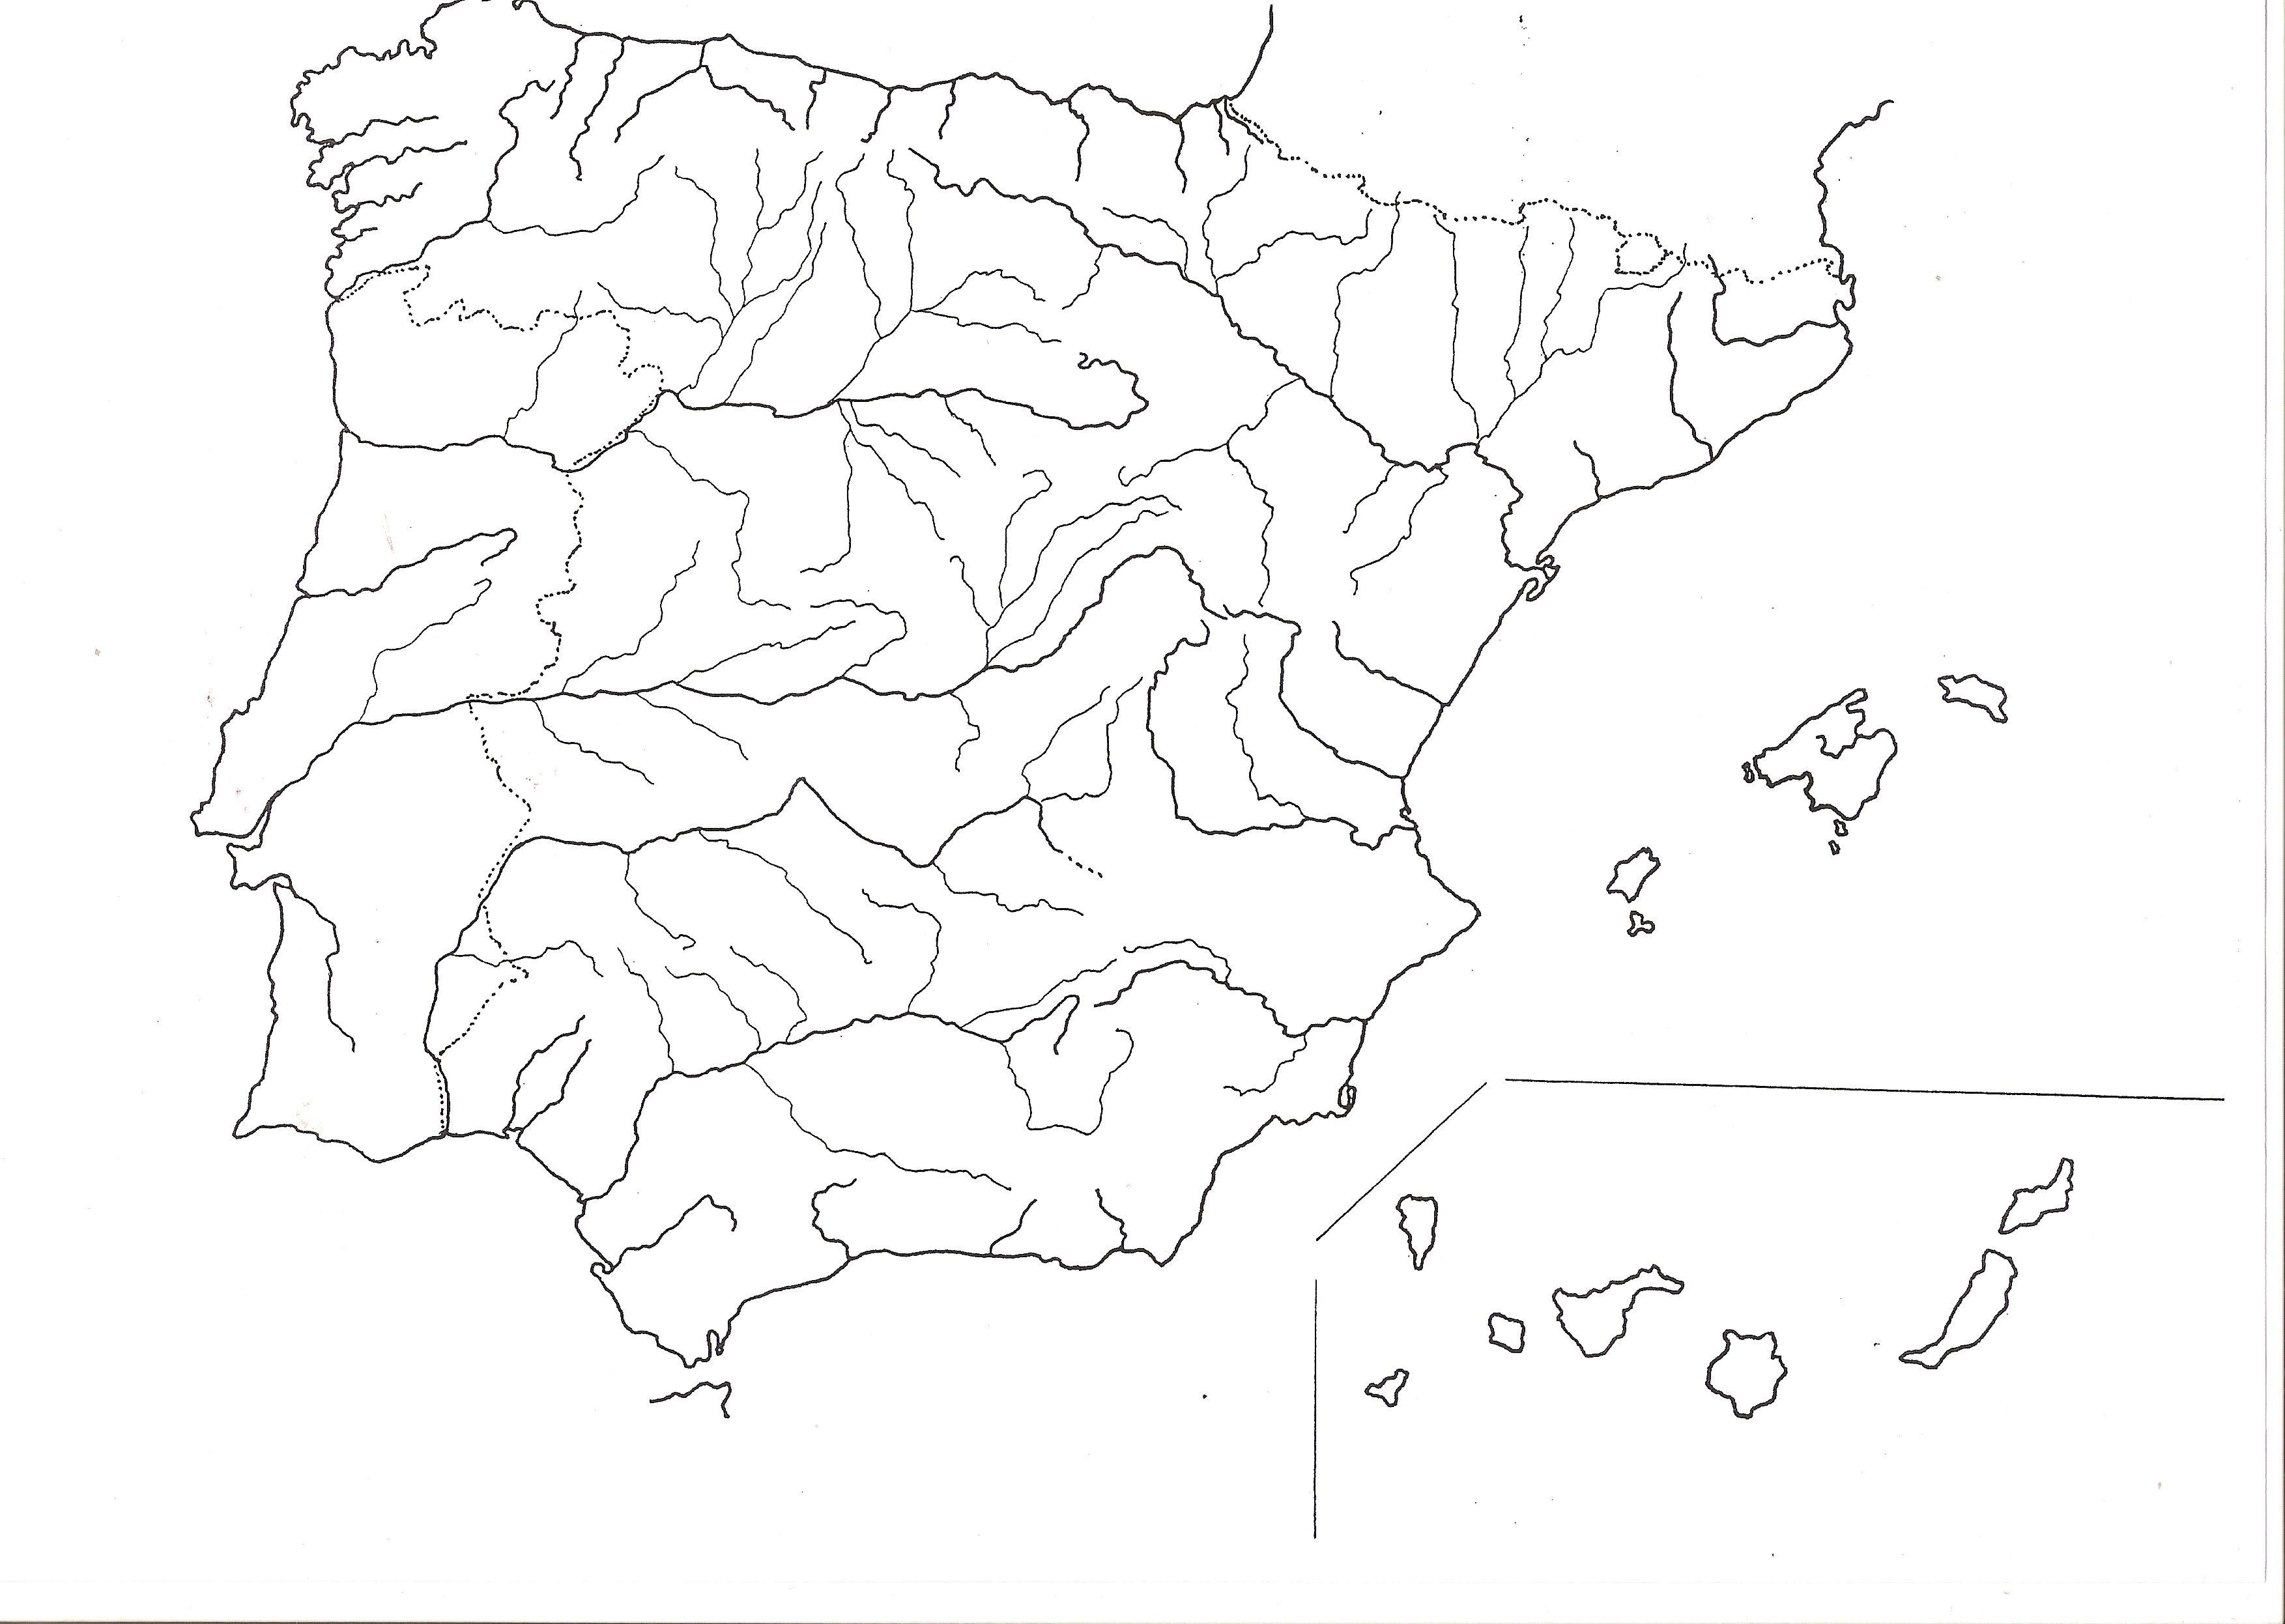 Mapa Fisico Peninsula Iberica Rios.Espana Mapa Rios Rios De Espana Espana Y Mapa De Espana